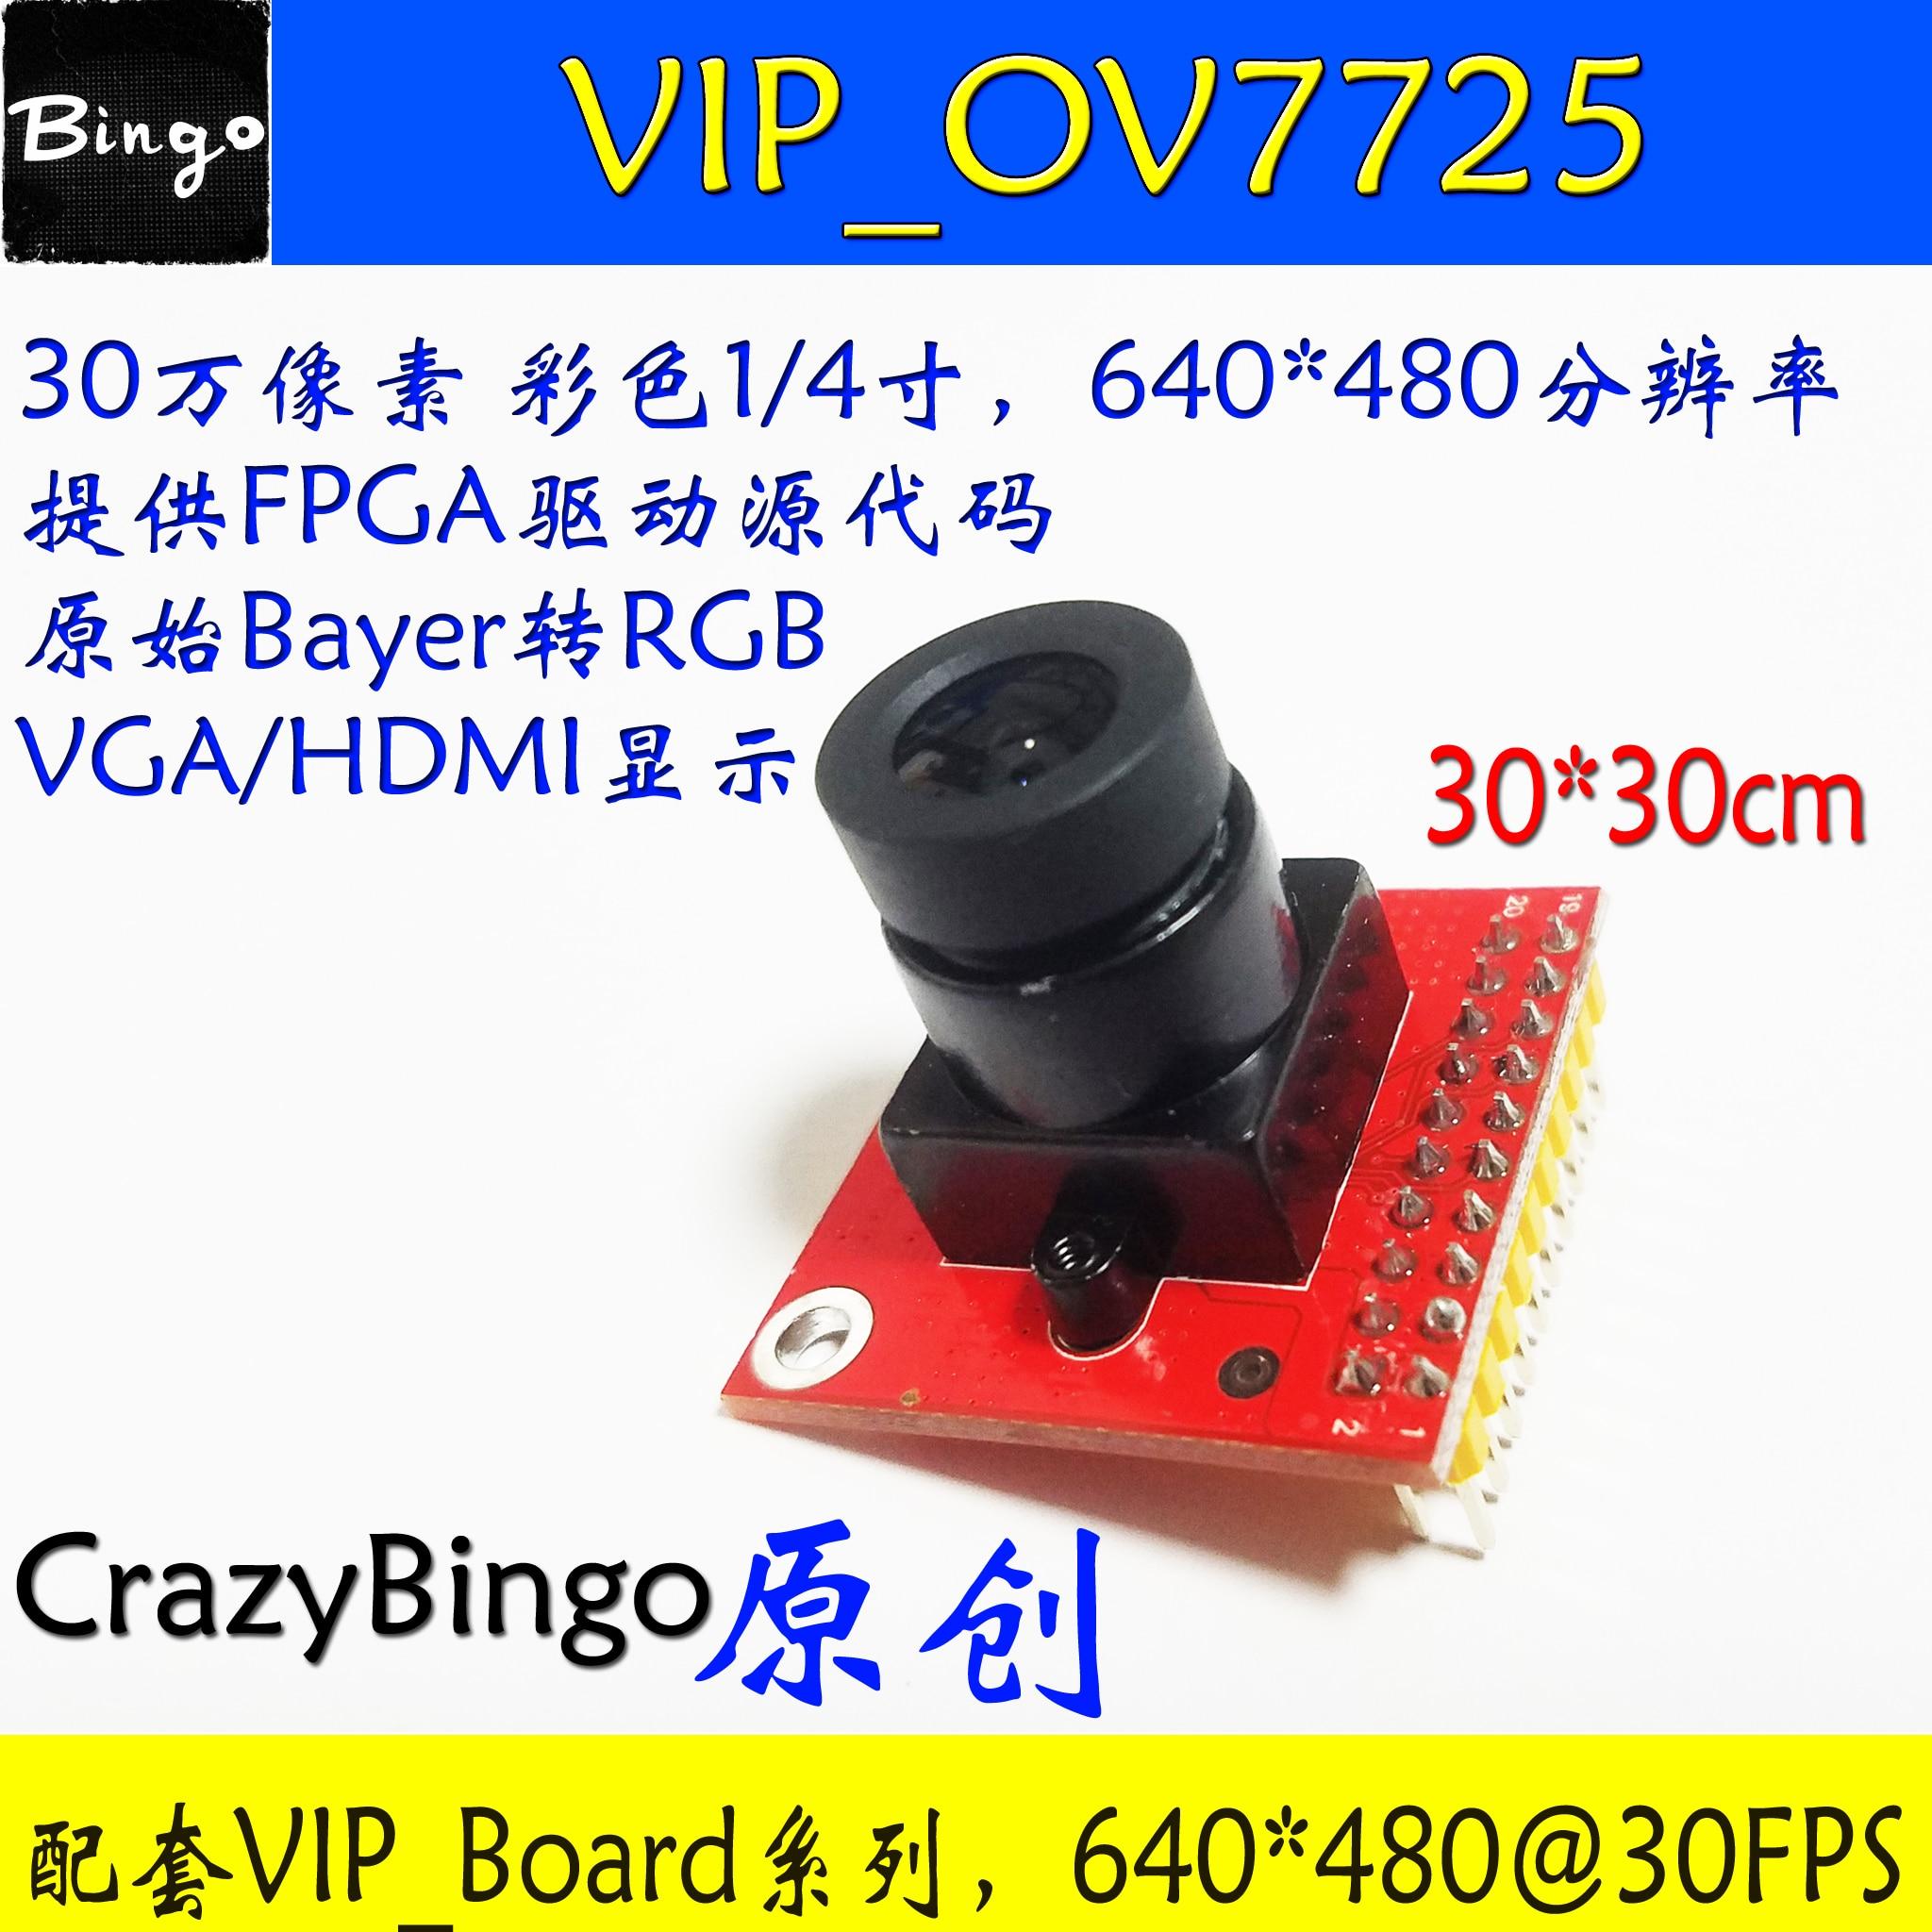 30W CMOS Camera OV7725 FPGA Development Project Bayer to RGB VGA HDMI Display30W CMOS Camera OV7725 FPGA Development Project Bayer to RGB VGA HDMI Display